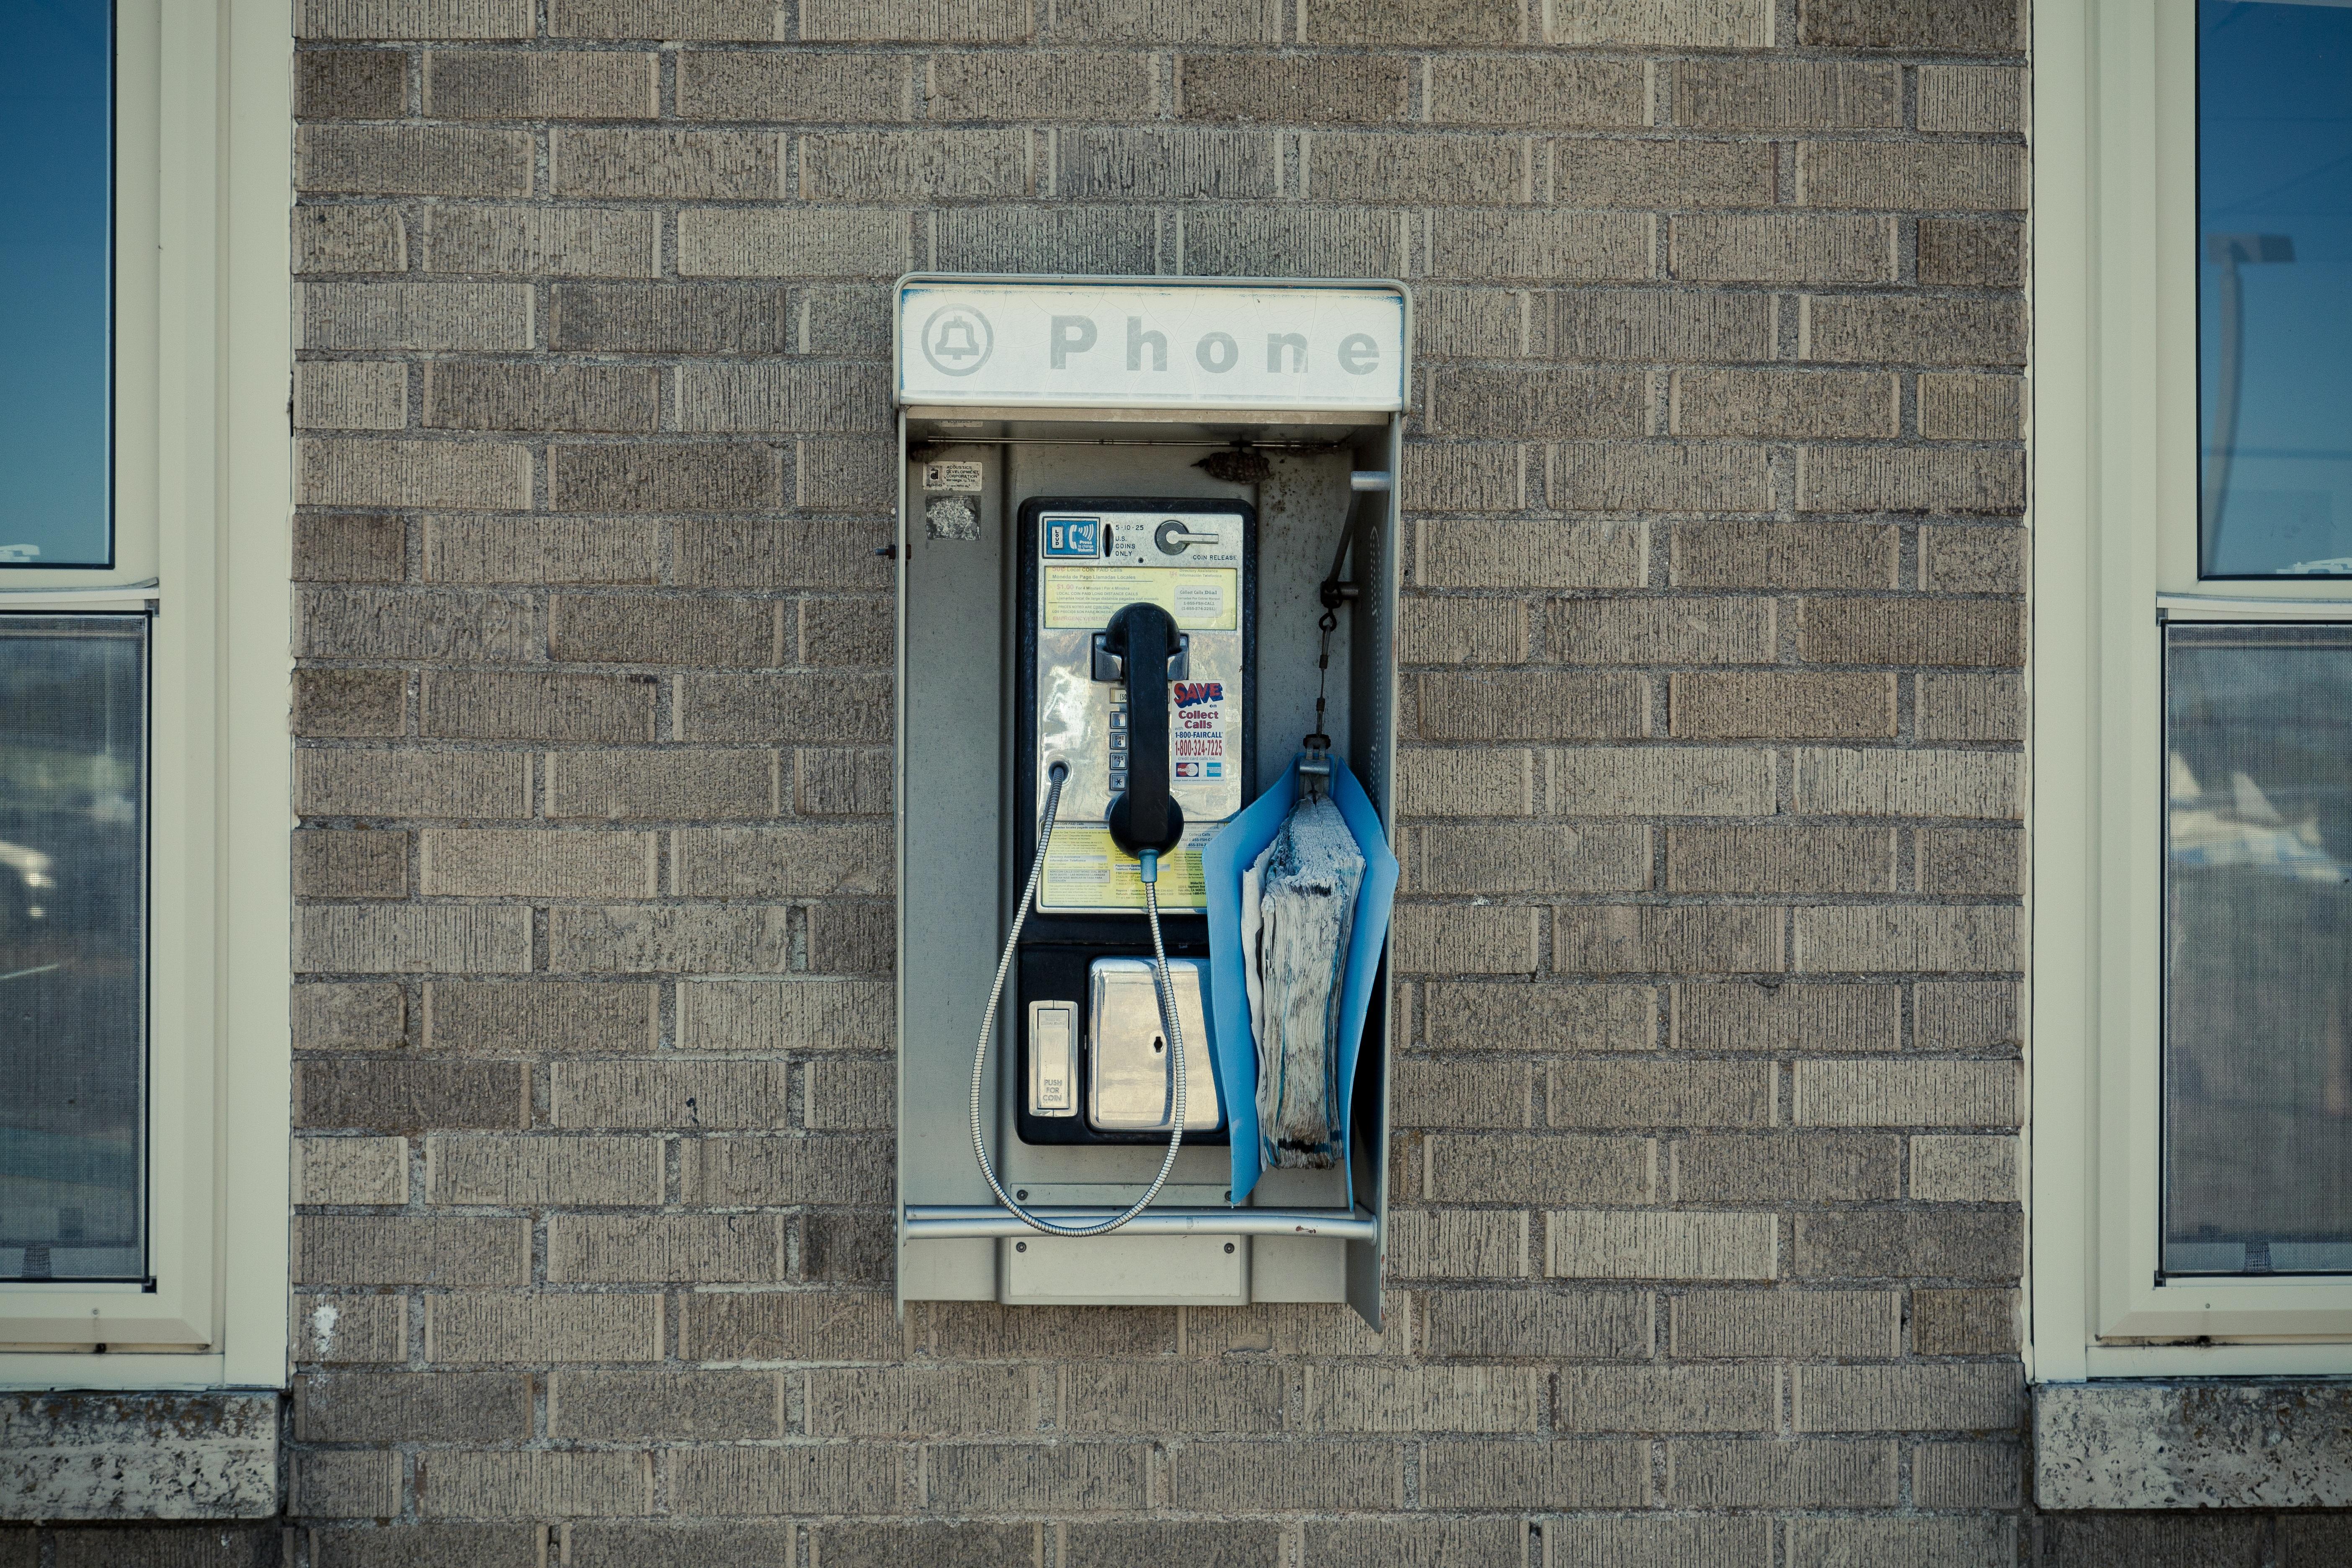 Architecture Street Retro Window Old Home Wall Phone Telephone  Communication Facade Blue Lighting Door Interior Design